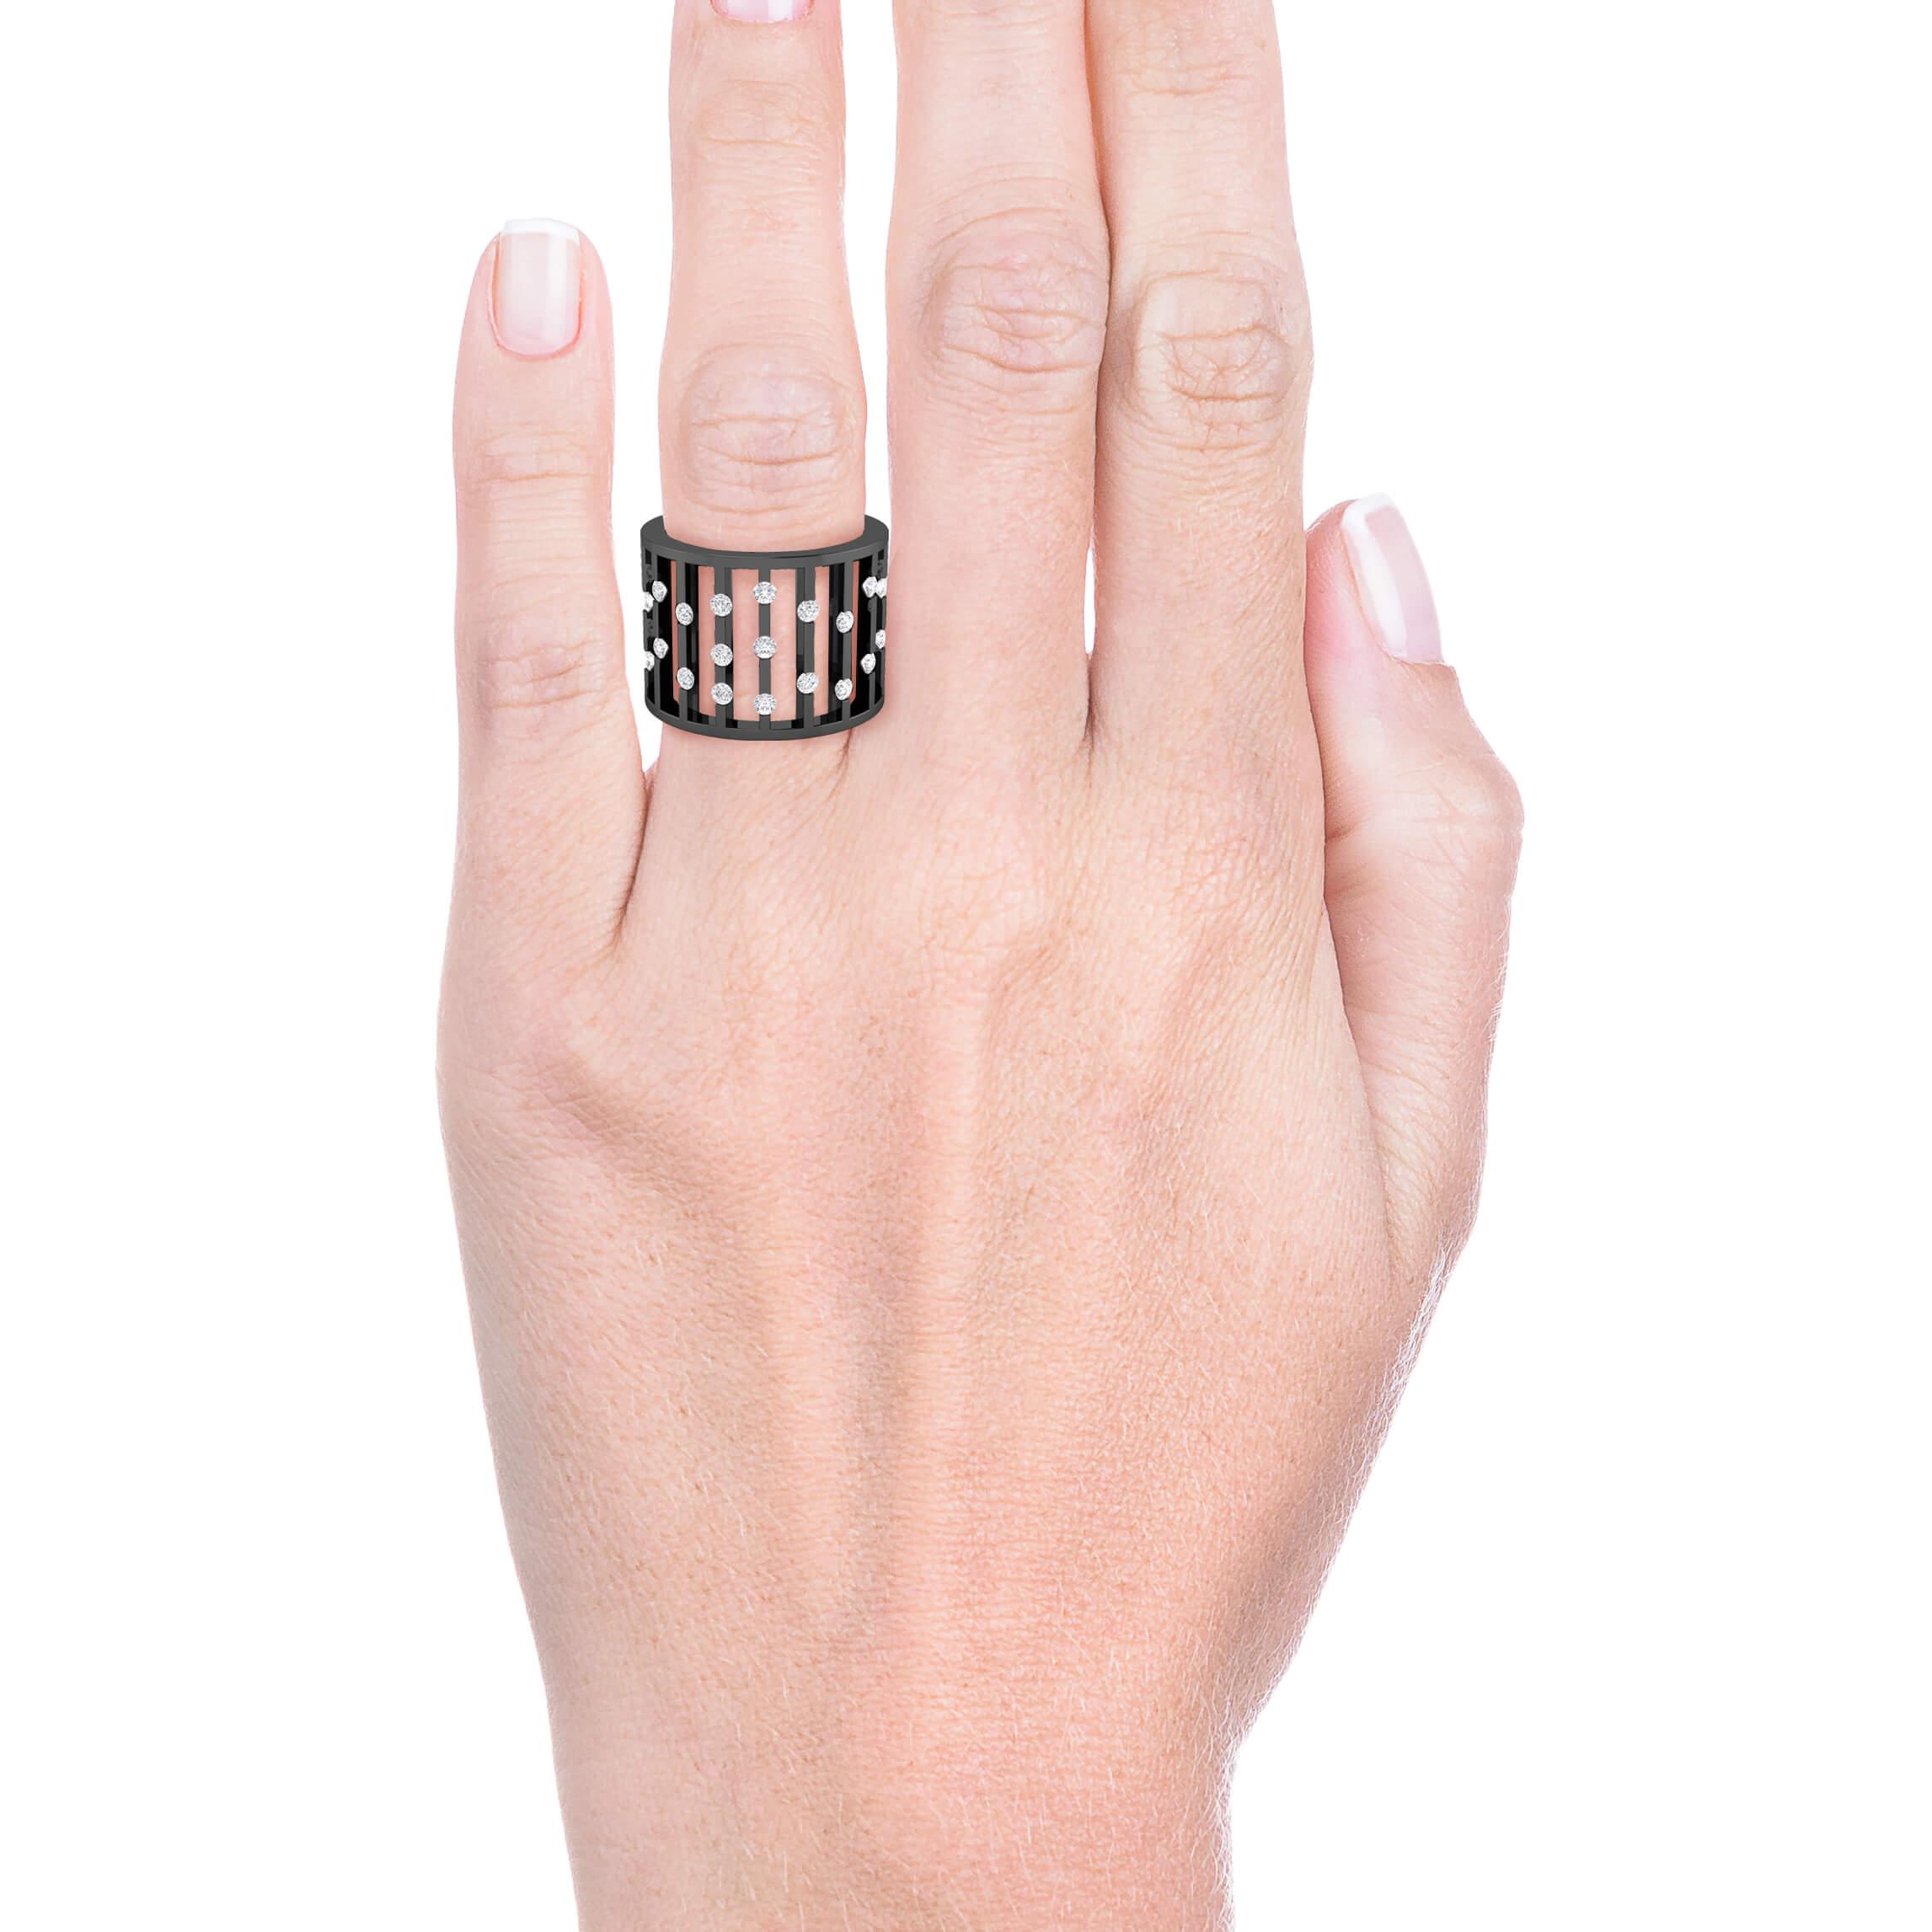 Diamond Ring 18k black gold black rhodium with 27 brilliant cut diamond